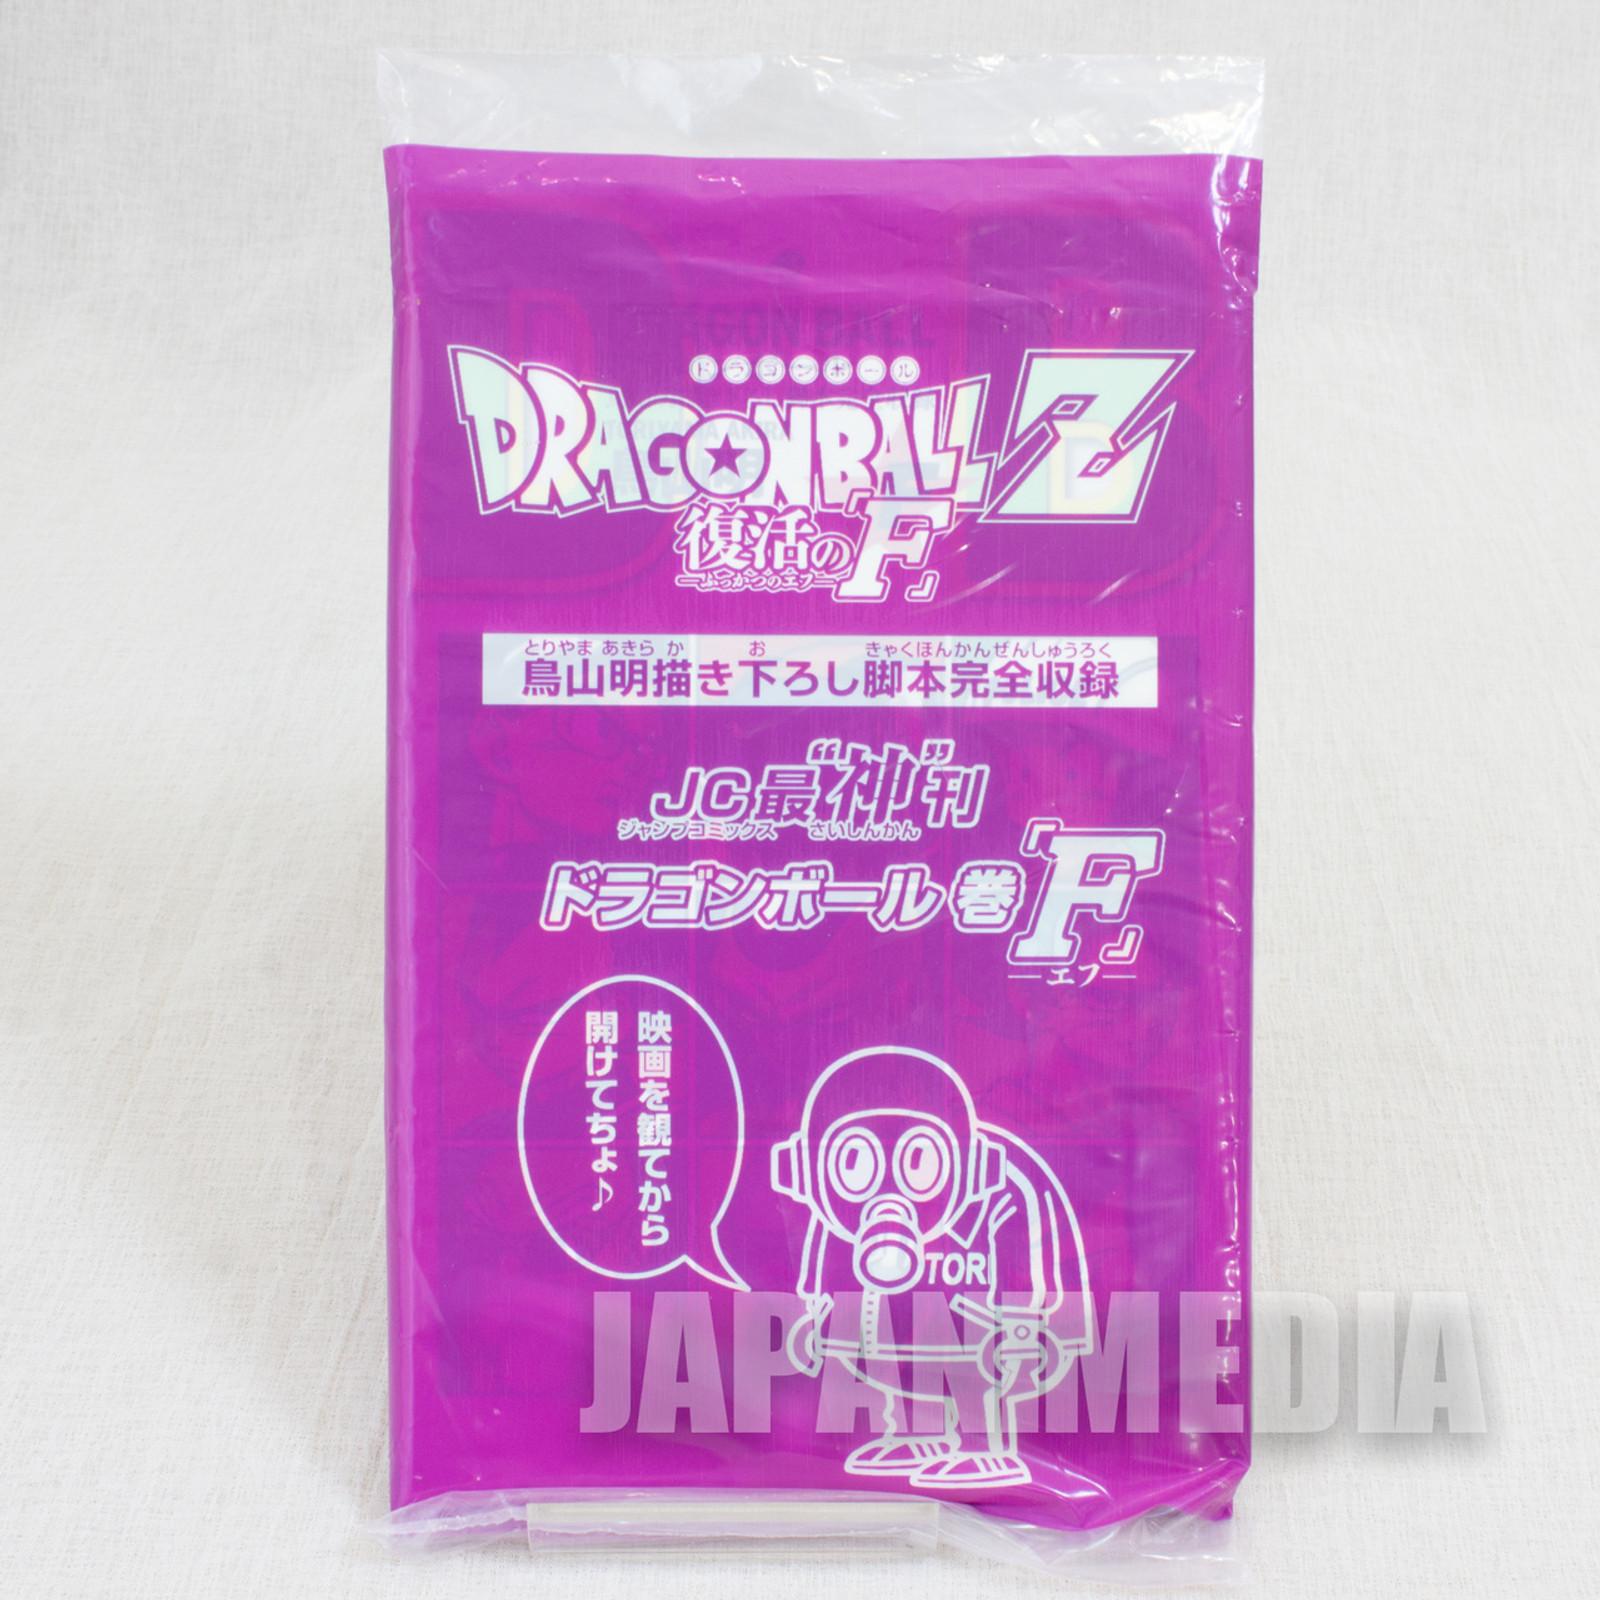 Dragon Ball Z Resurrection 'F' Comic Book Theater limited JAPAN ANIME MANGA